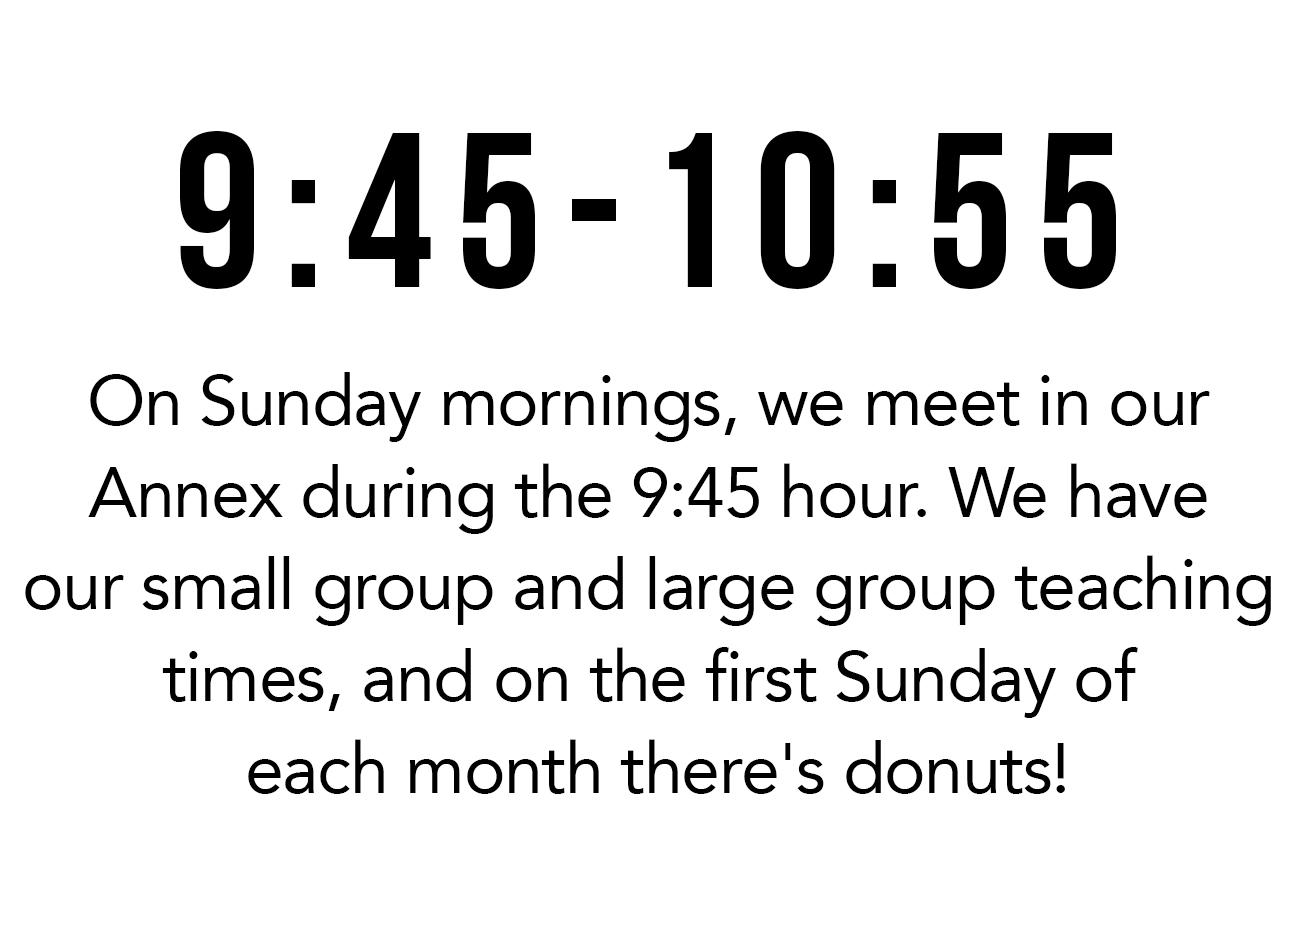 9:45-10:55